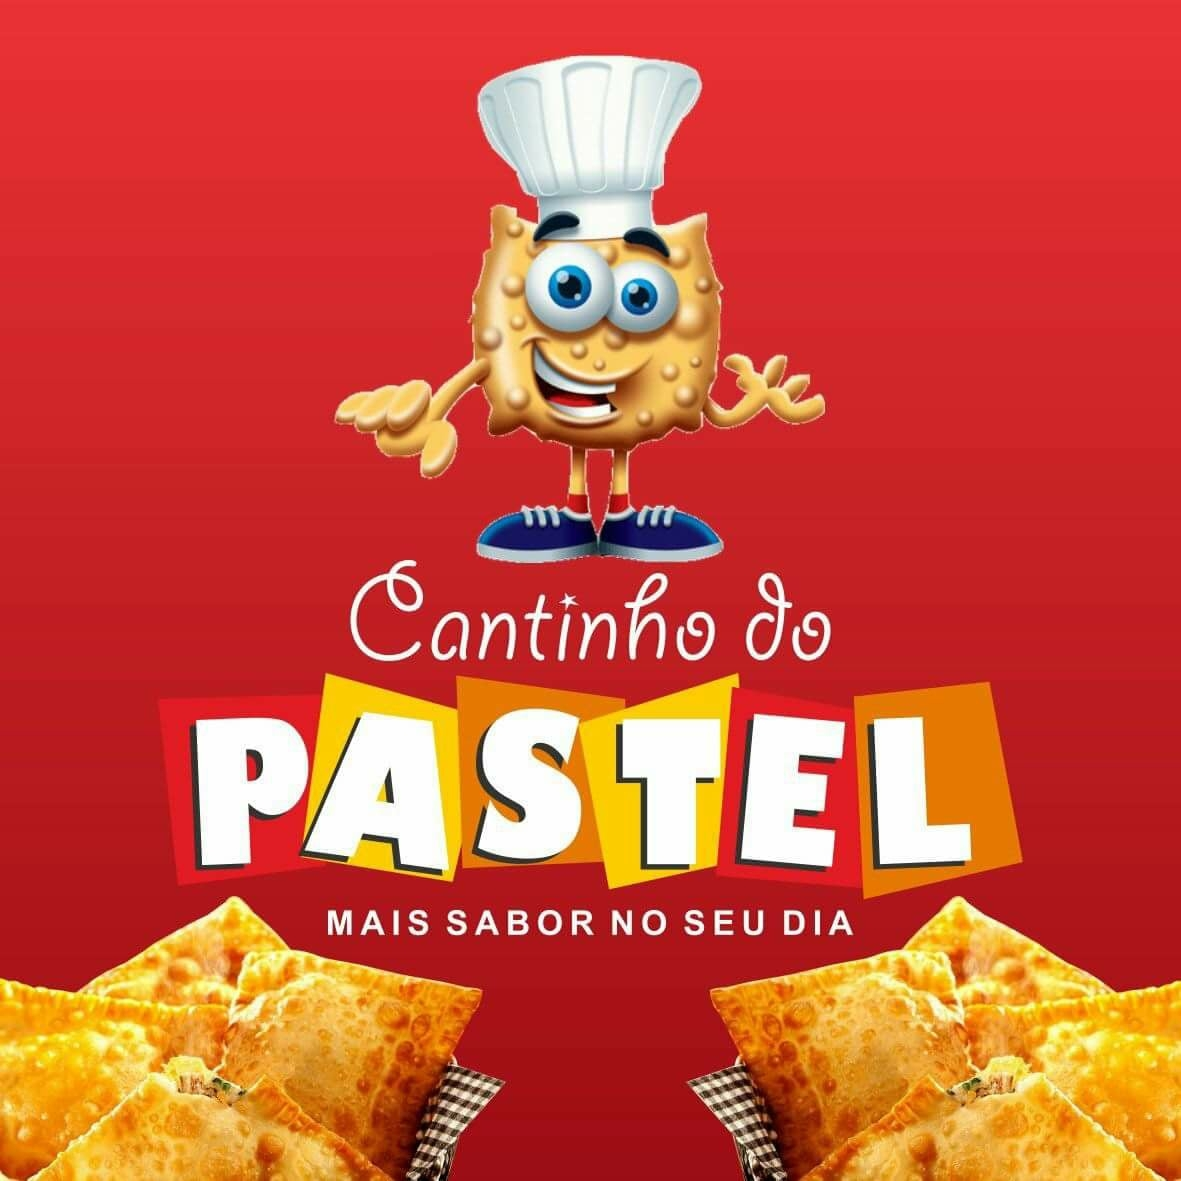 DISTRIBUIDORA CANTINHO DO PASTEL